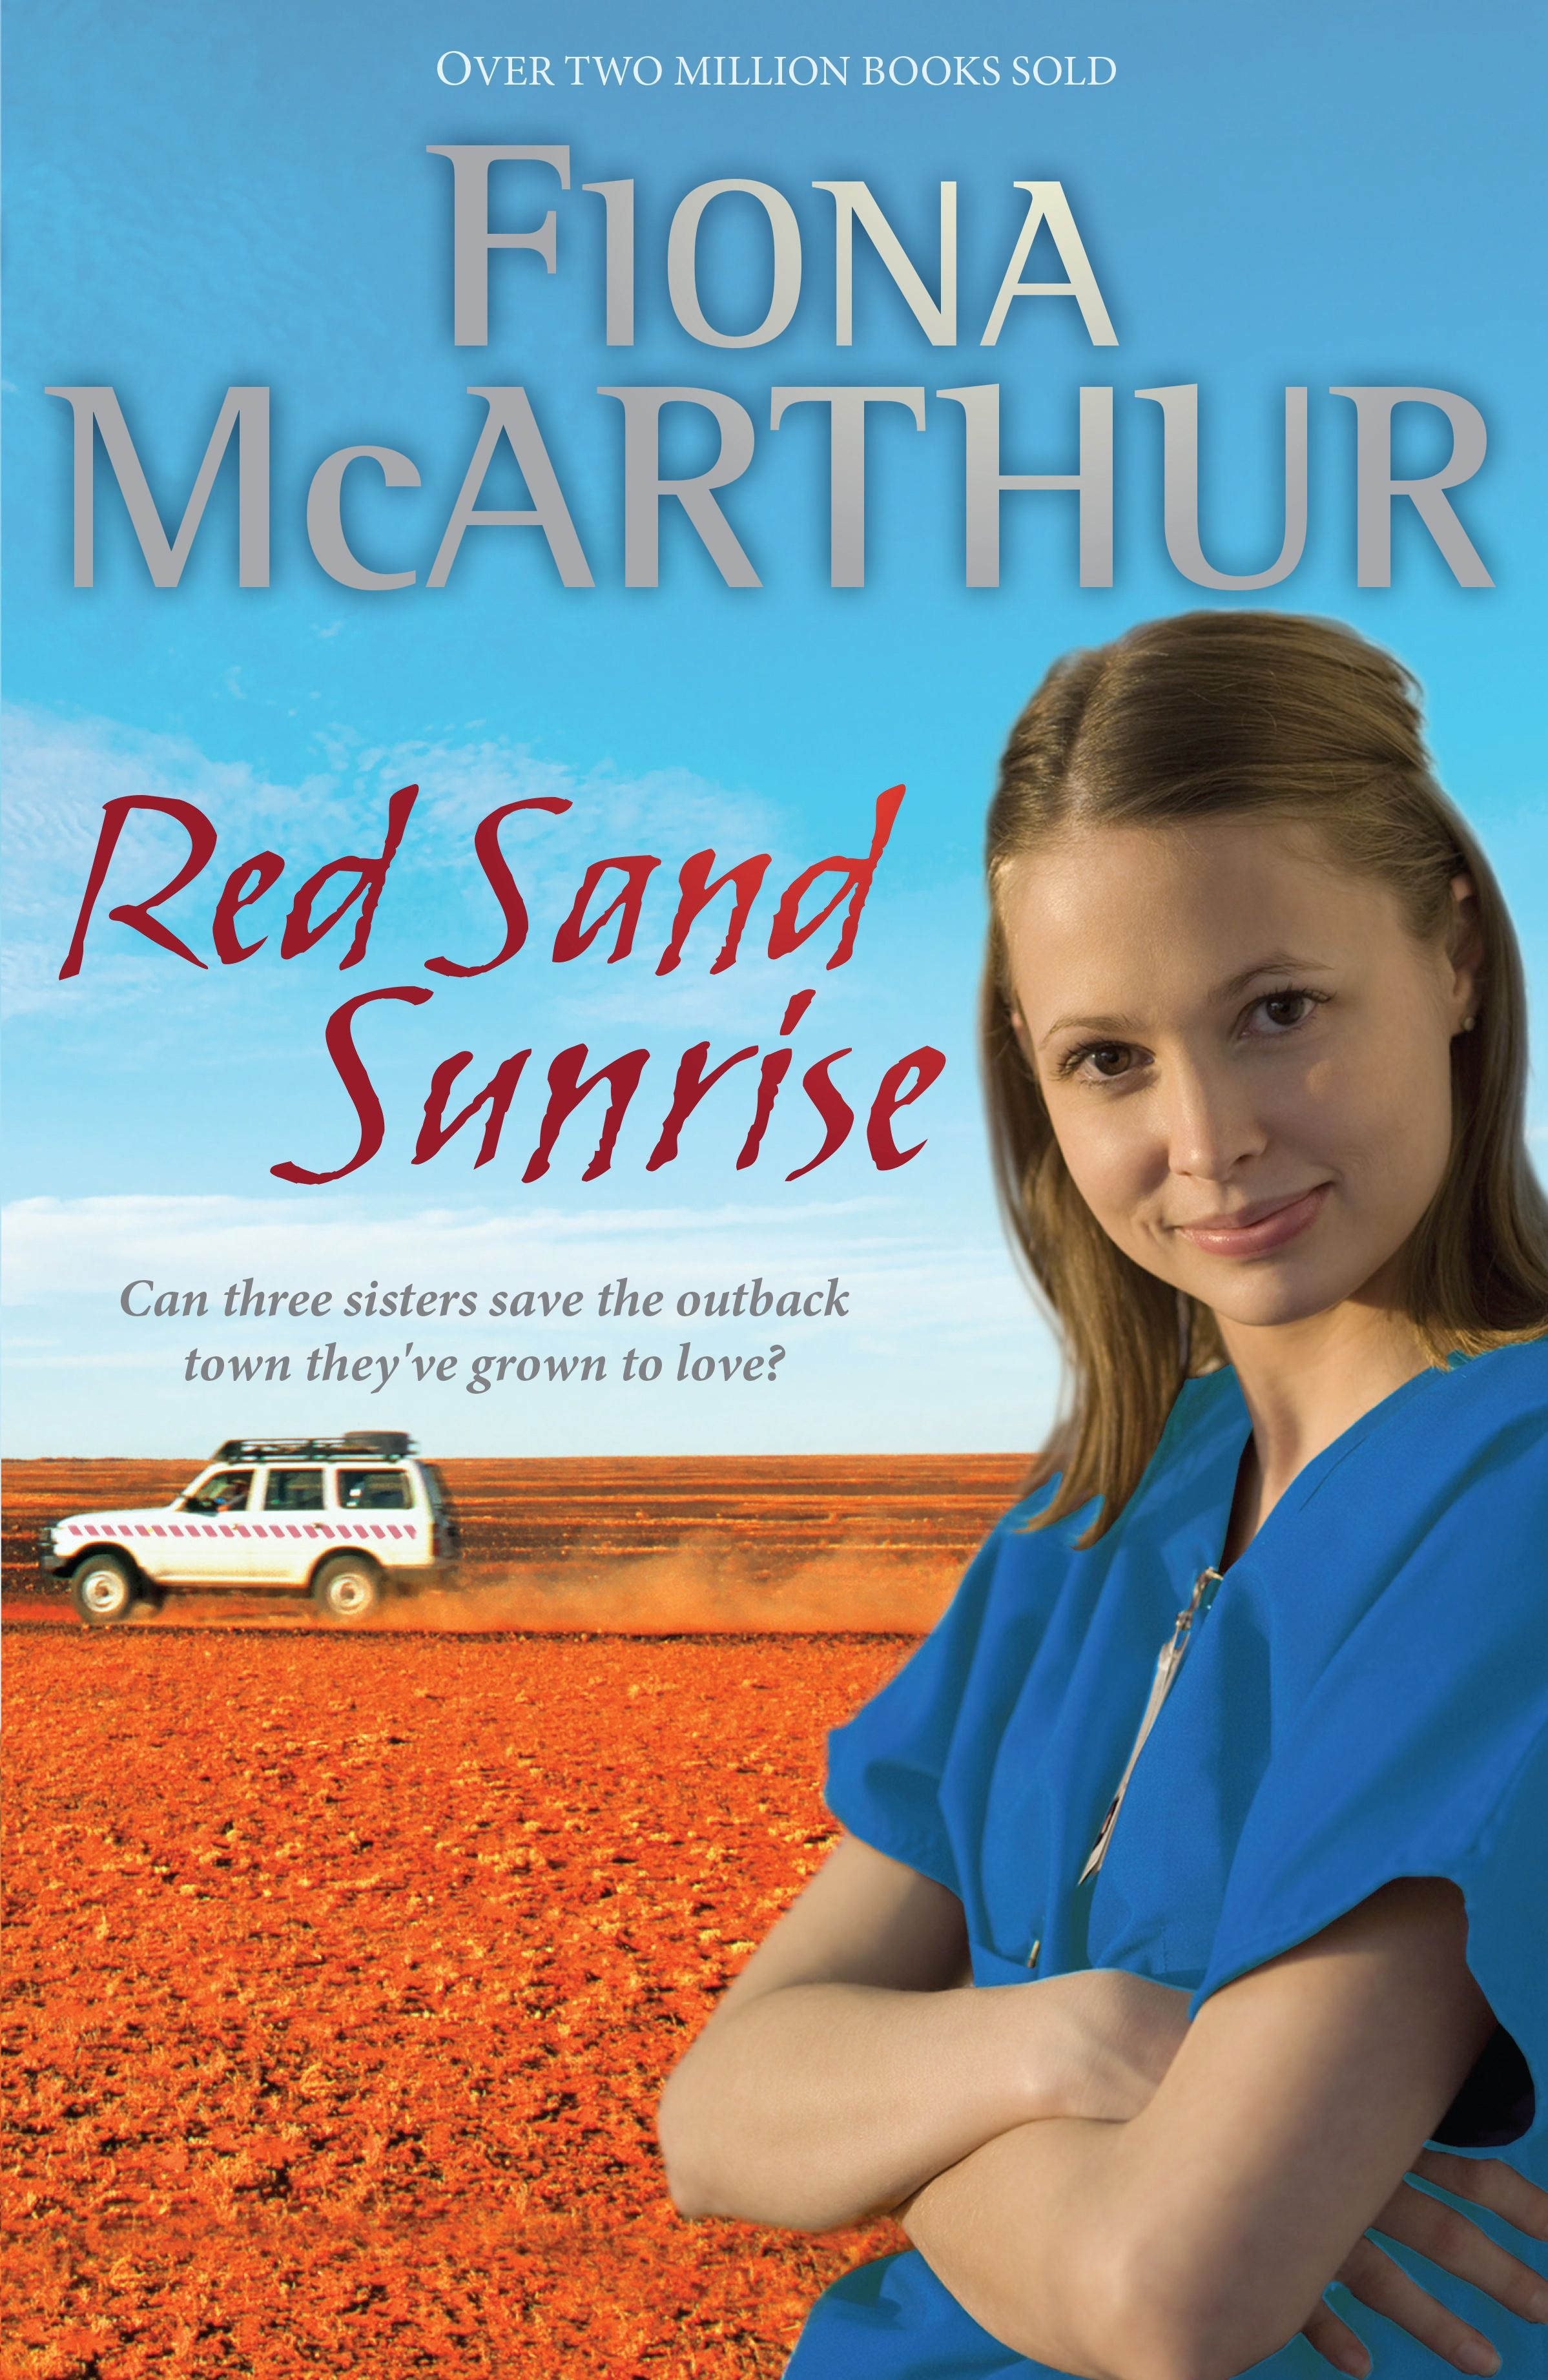 Red Sand Sunrise Better Reading Books, Mcarthur, Day book